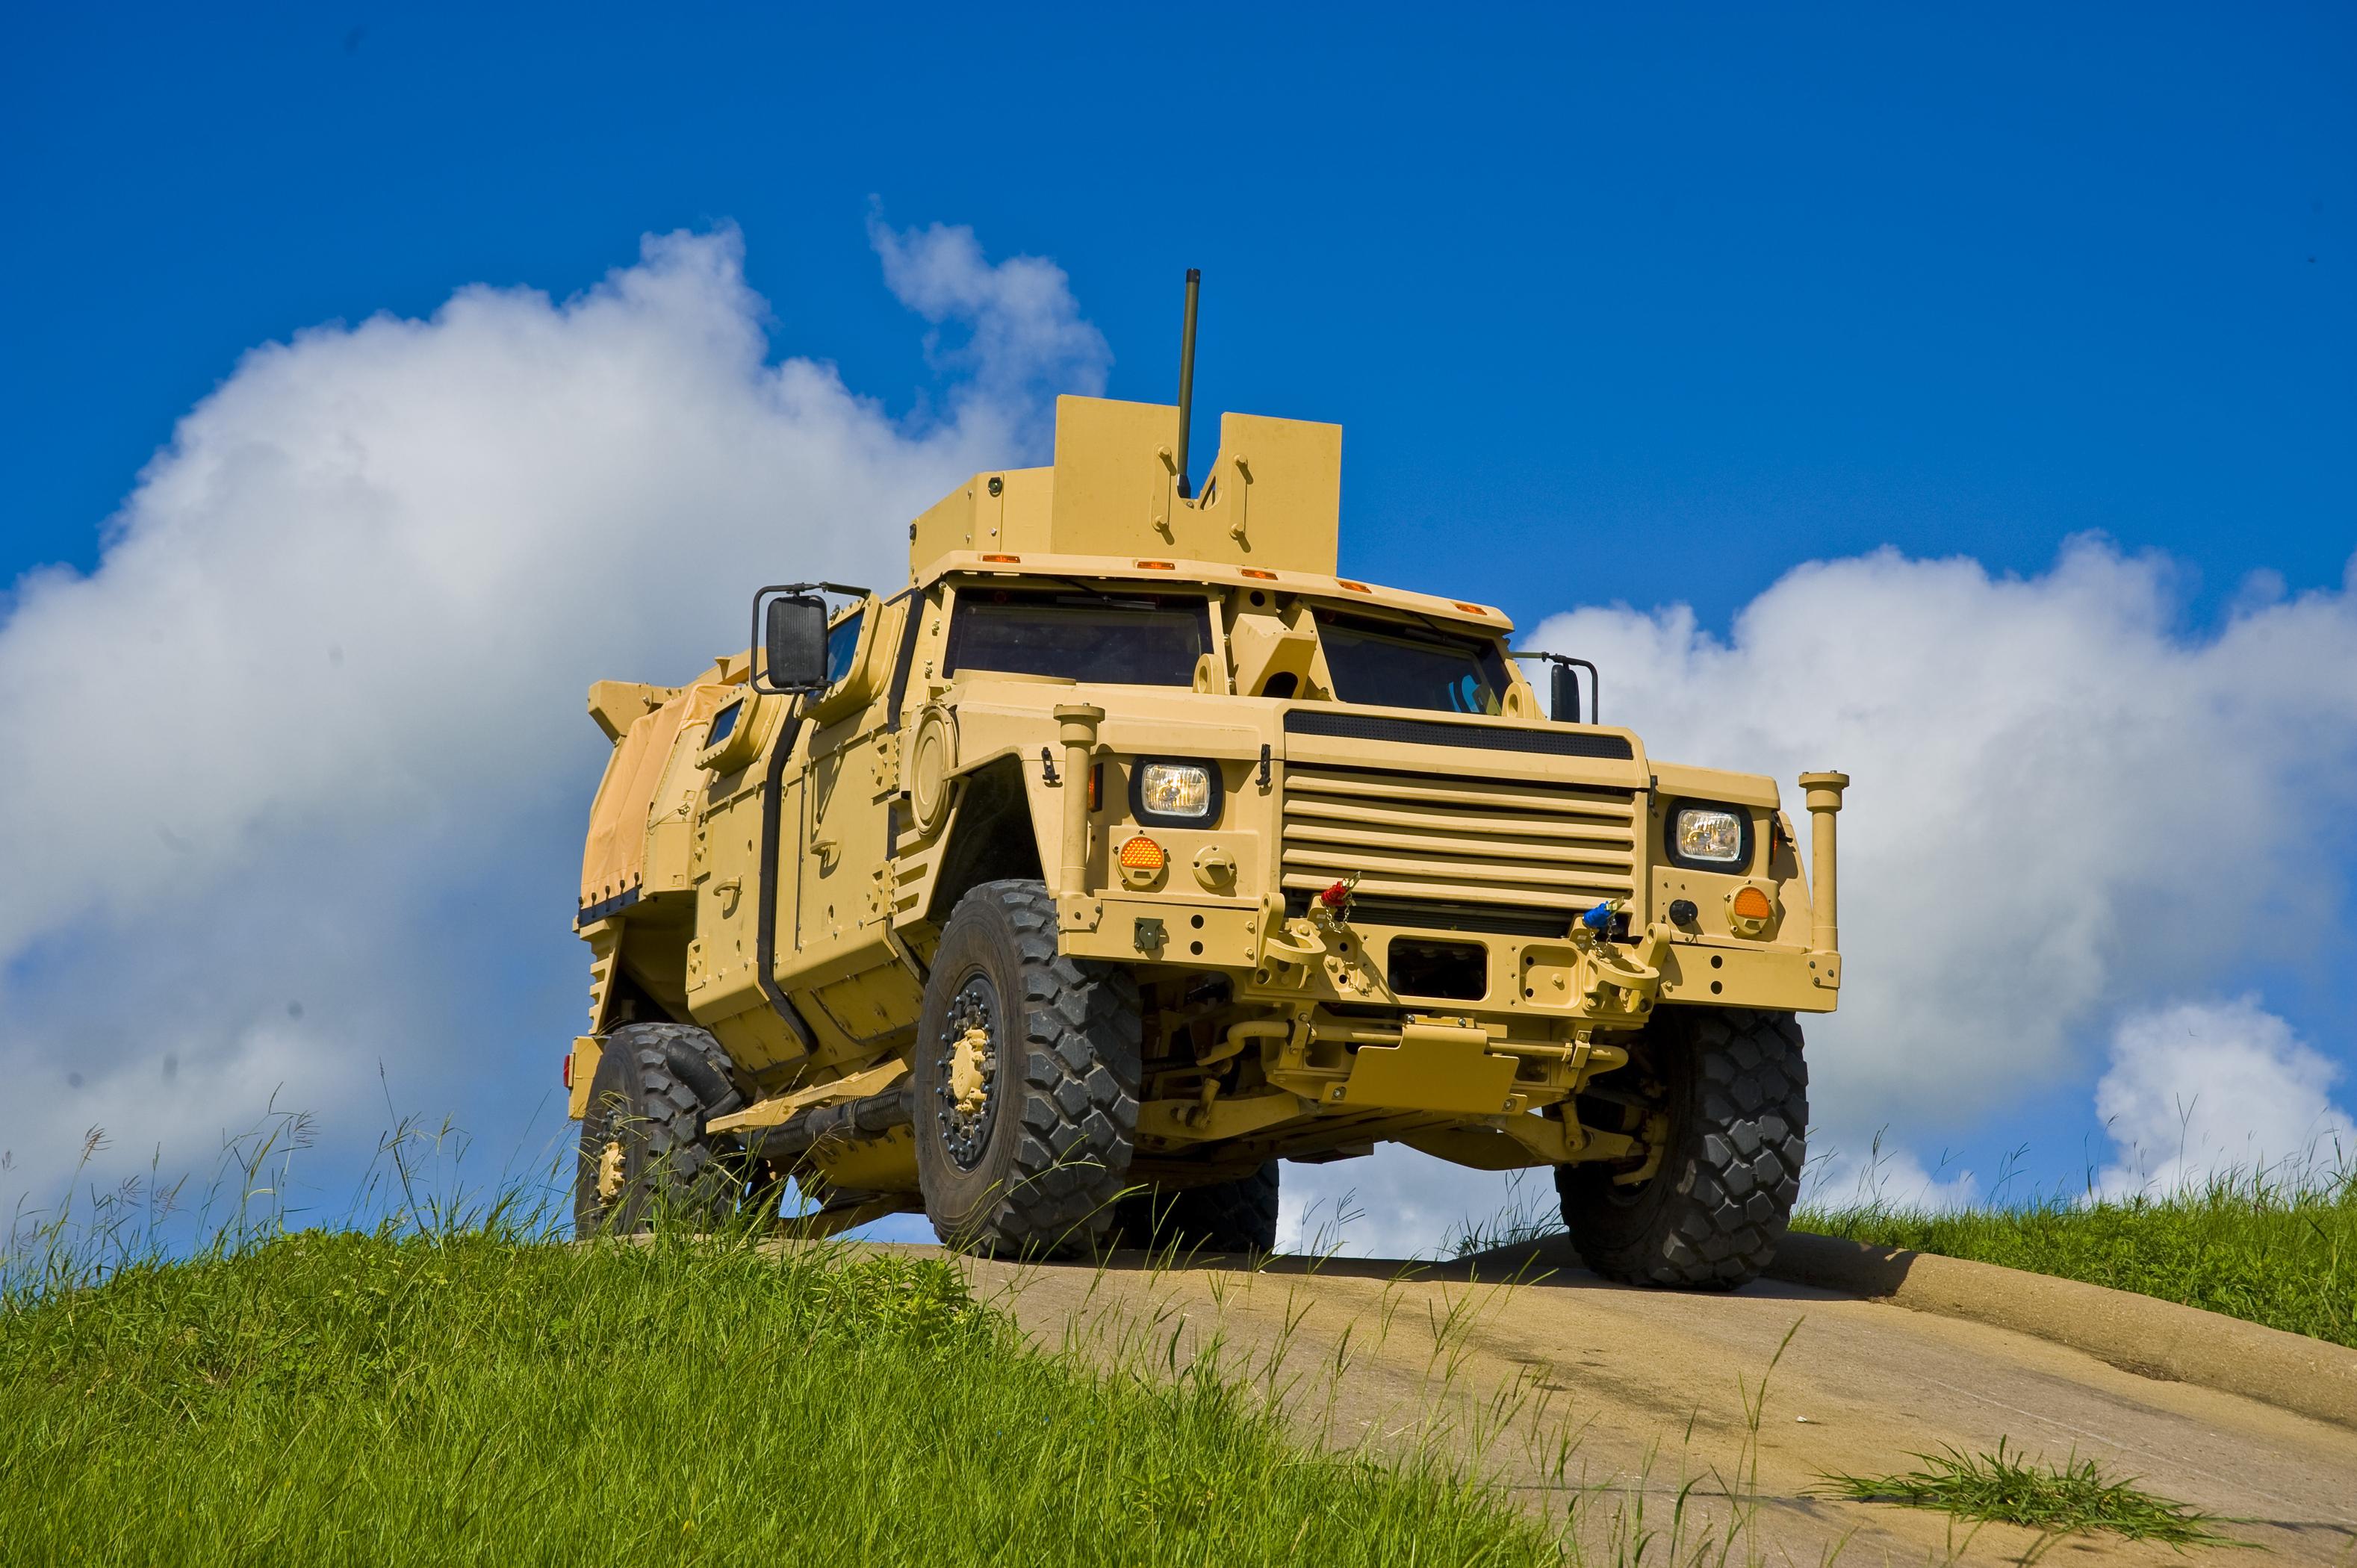 JLTV корпорации Lockheed Martin. Источник: www.lockheedmartin.com